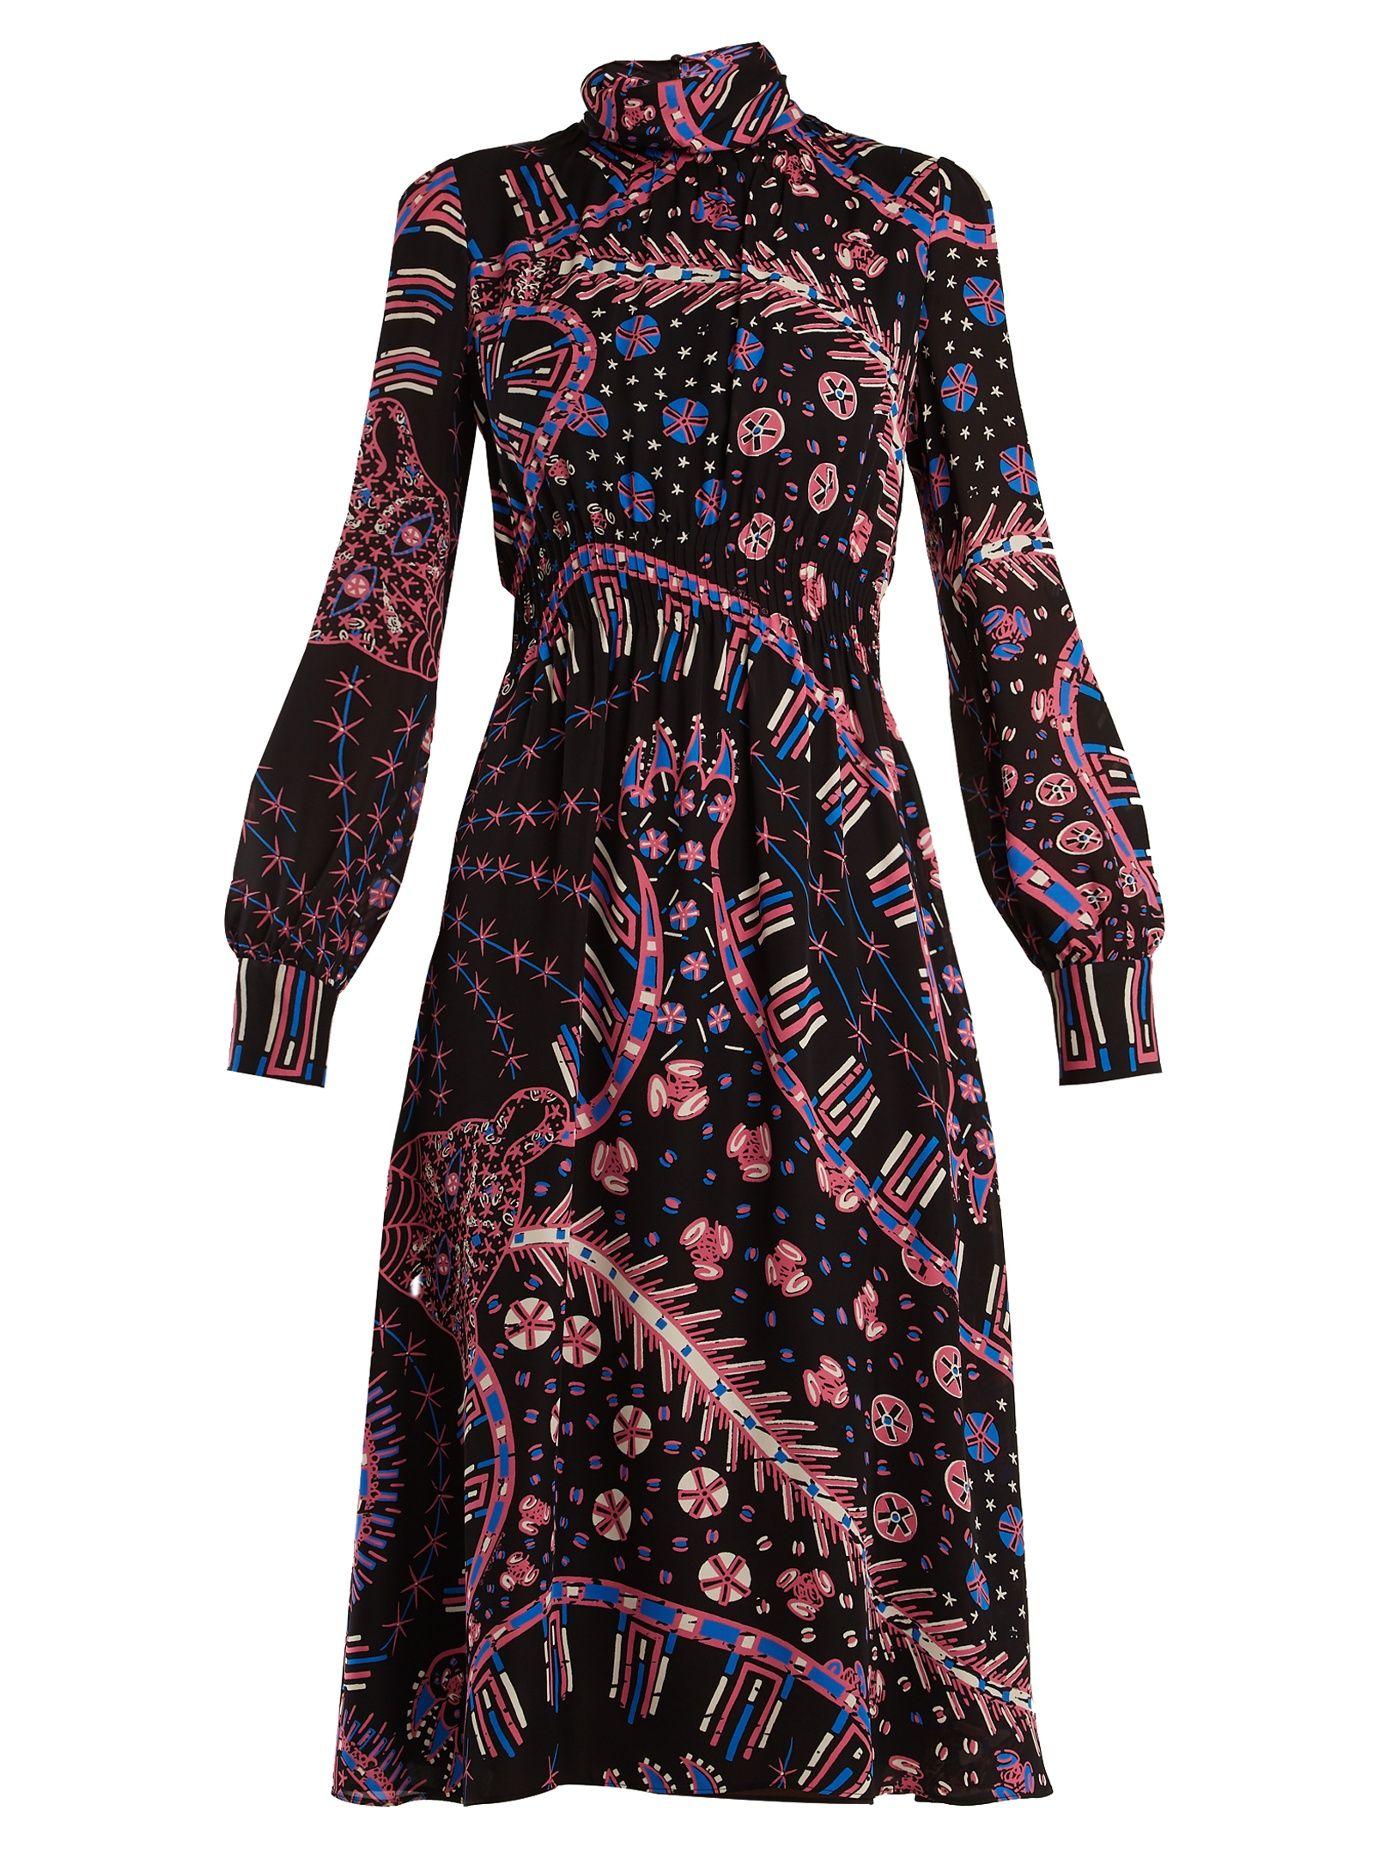 Valentino X Zandra Rhodes leopard-print dress  c7075a4e7